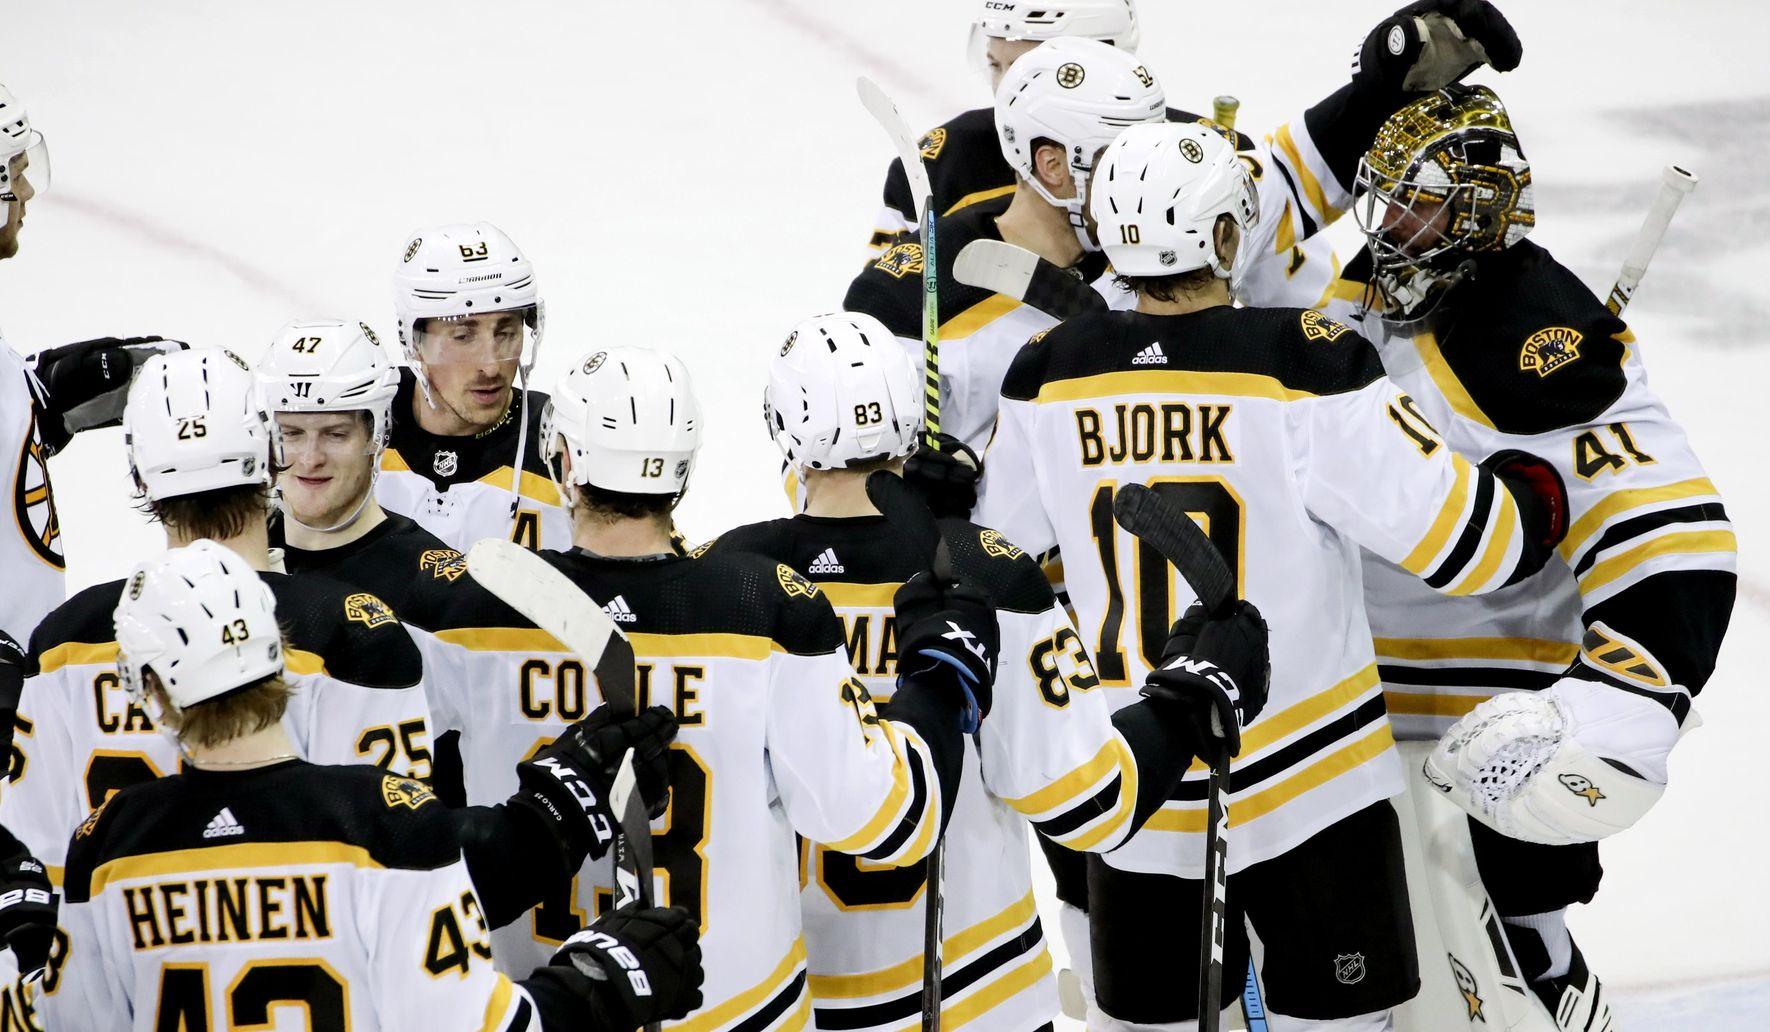 Bruins_rangers_hockey_02448_c0-180-4308-2691_s1770x1032